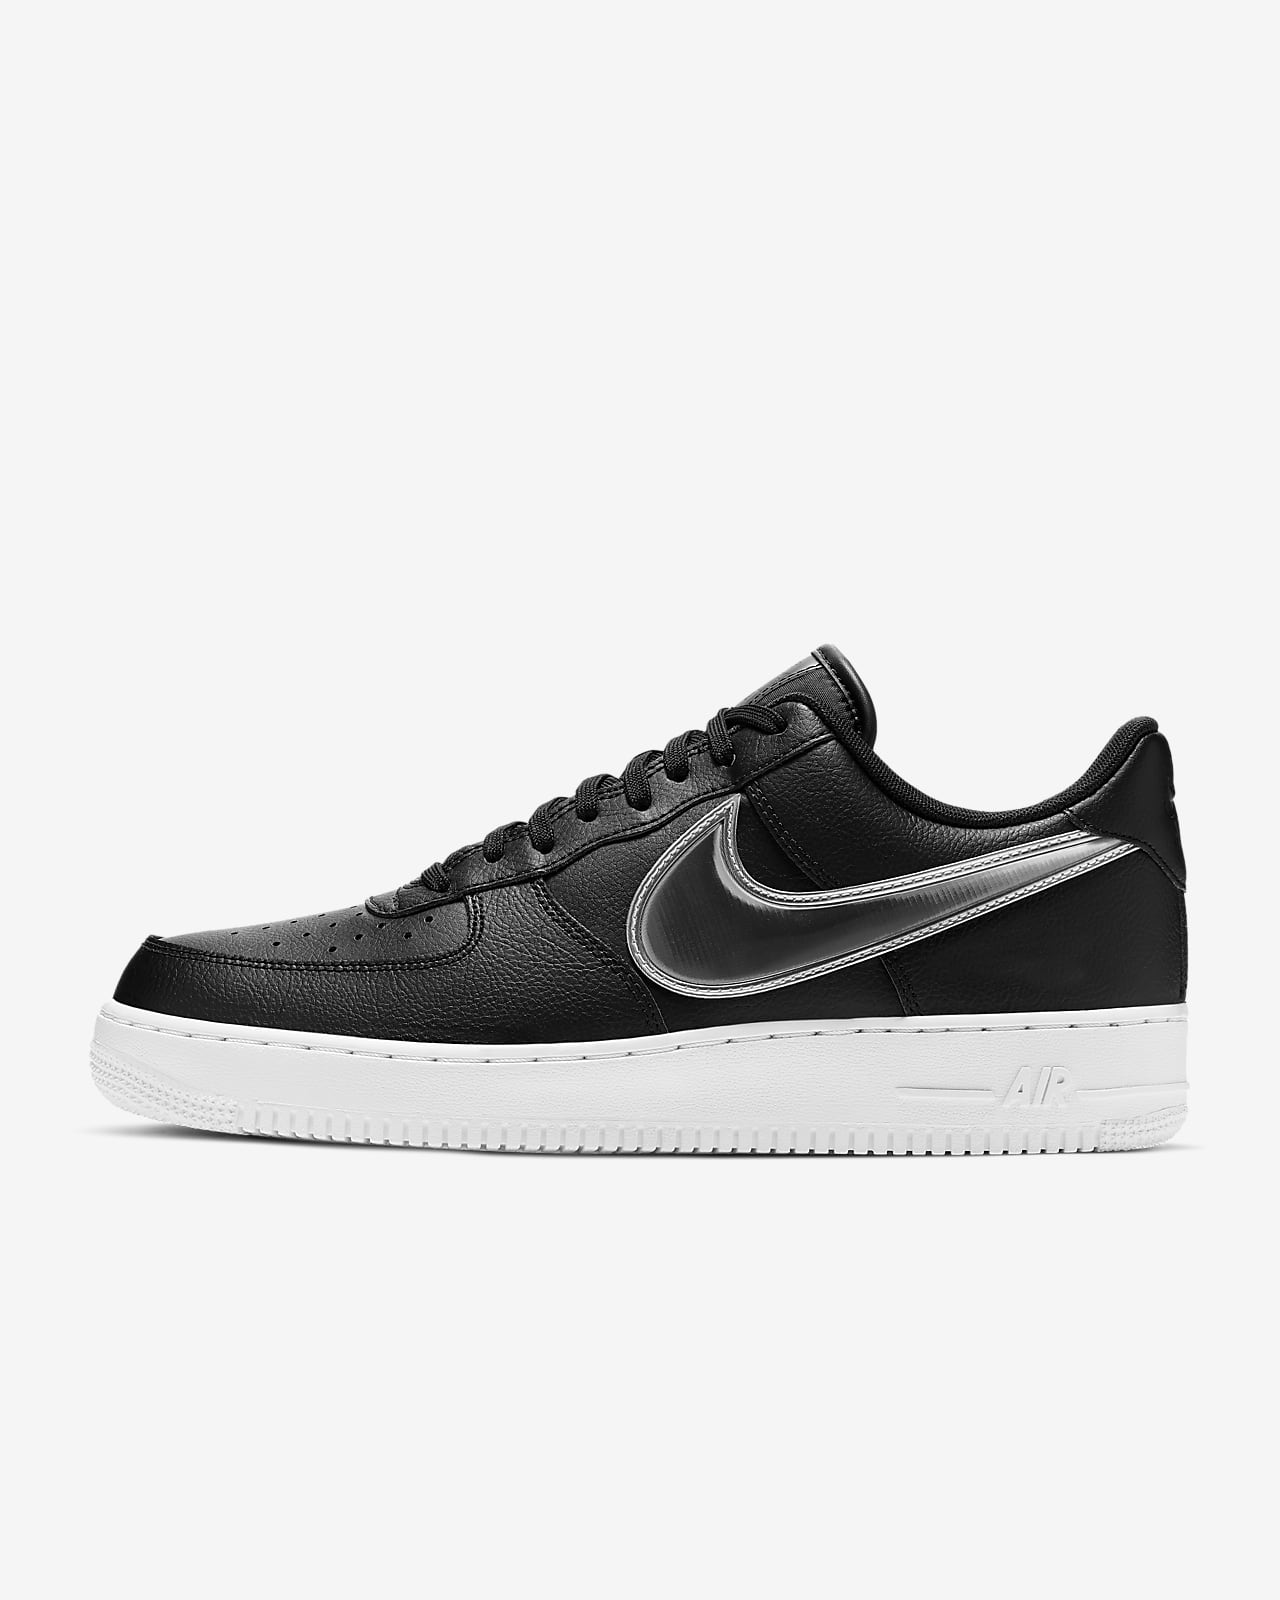 Nike Air Force 1 '07 LV8 3 Men's Shoe